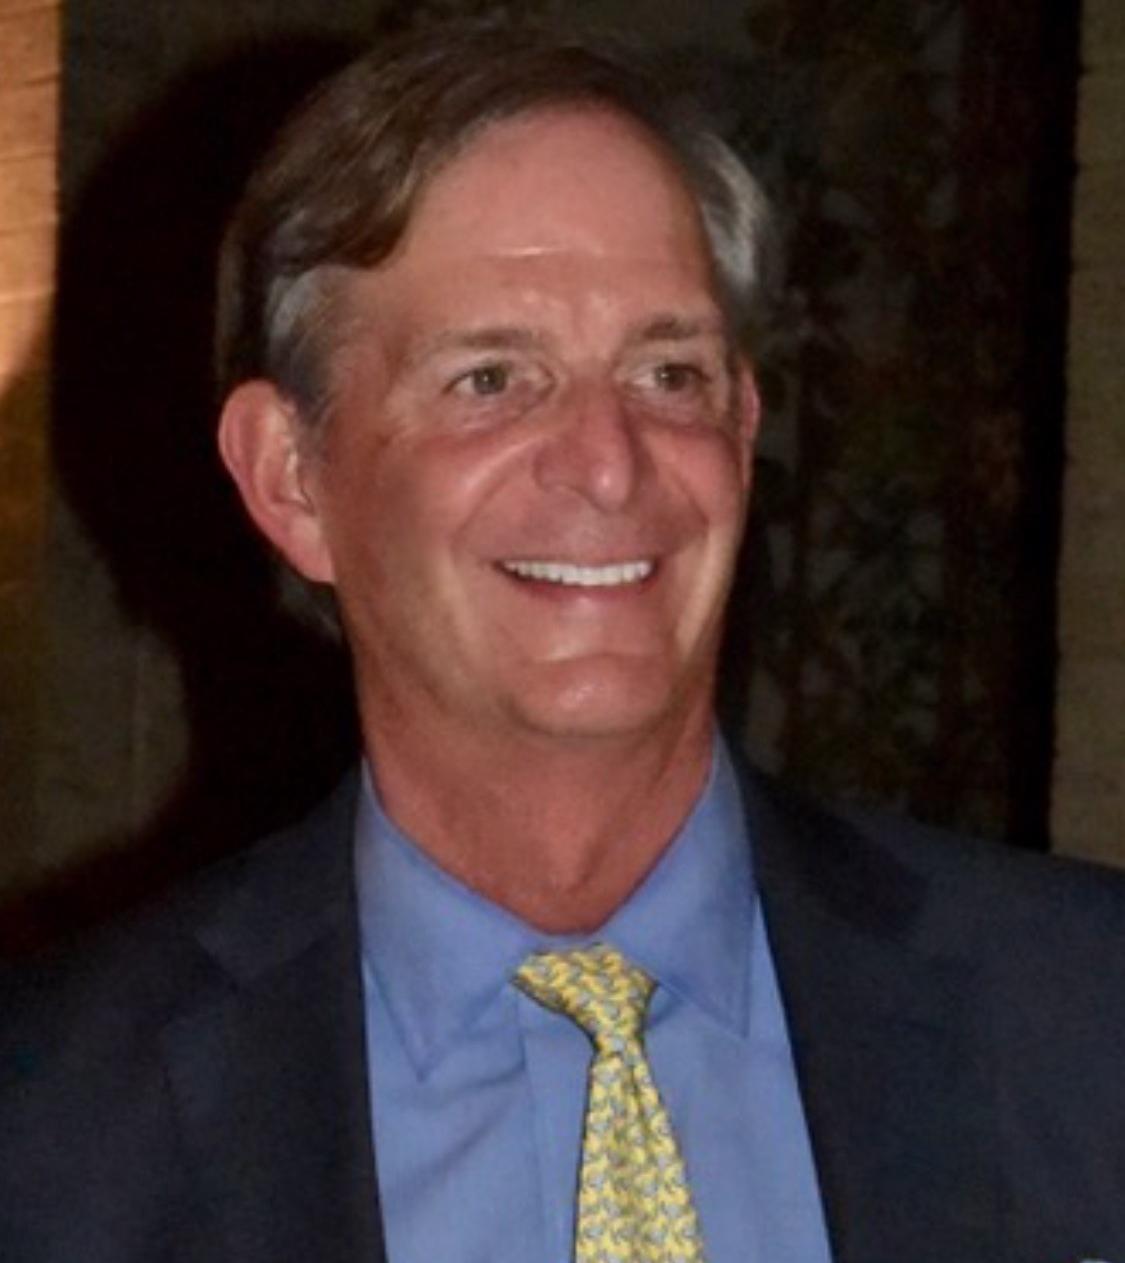 John LeBoutillier, Political Commentator